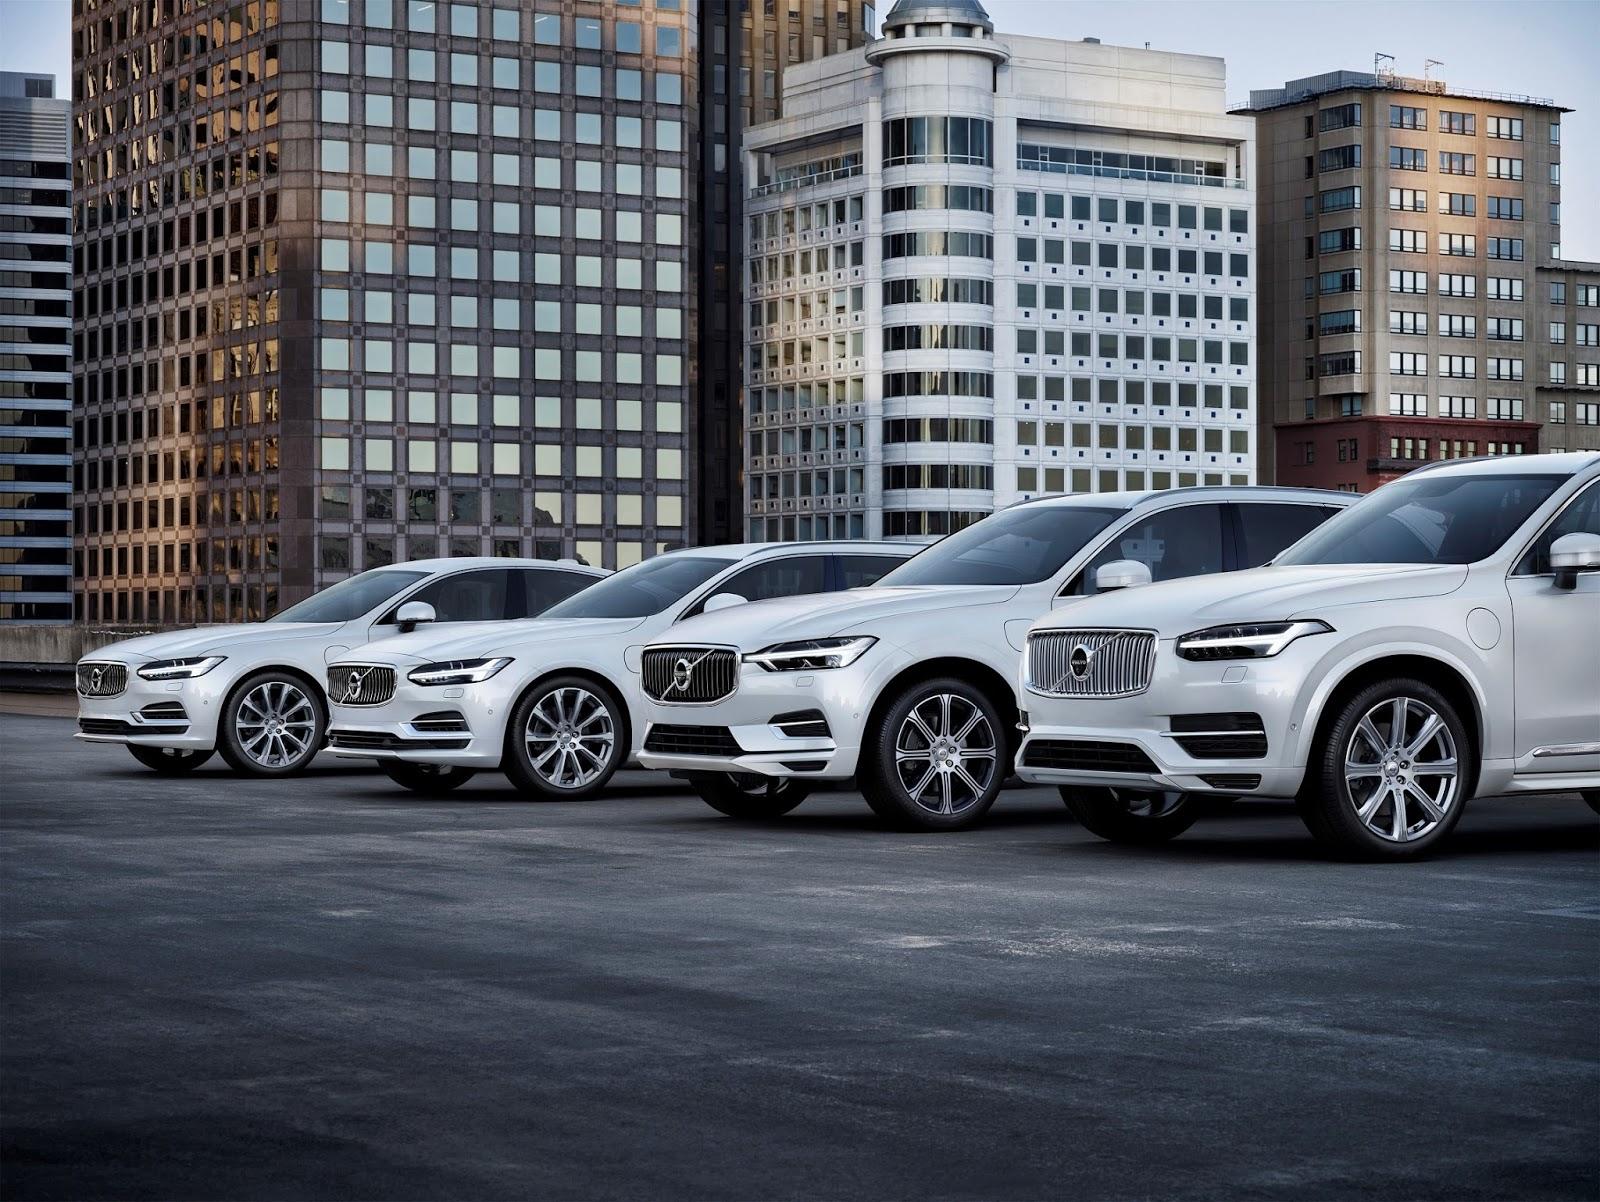 VOLVO T82BTWIN2BENGINE RANGE Από το 2019, όλα τα Volvo θα έχουν ηλεκτροκινητήρα Hybrid, Volvo, zblog, καινούργιο, καινούρια, υβριδικό